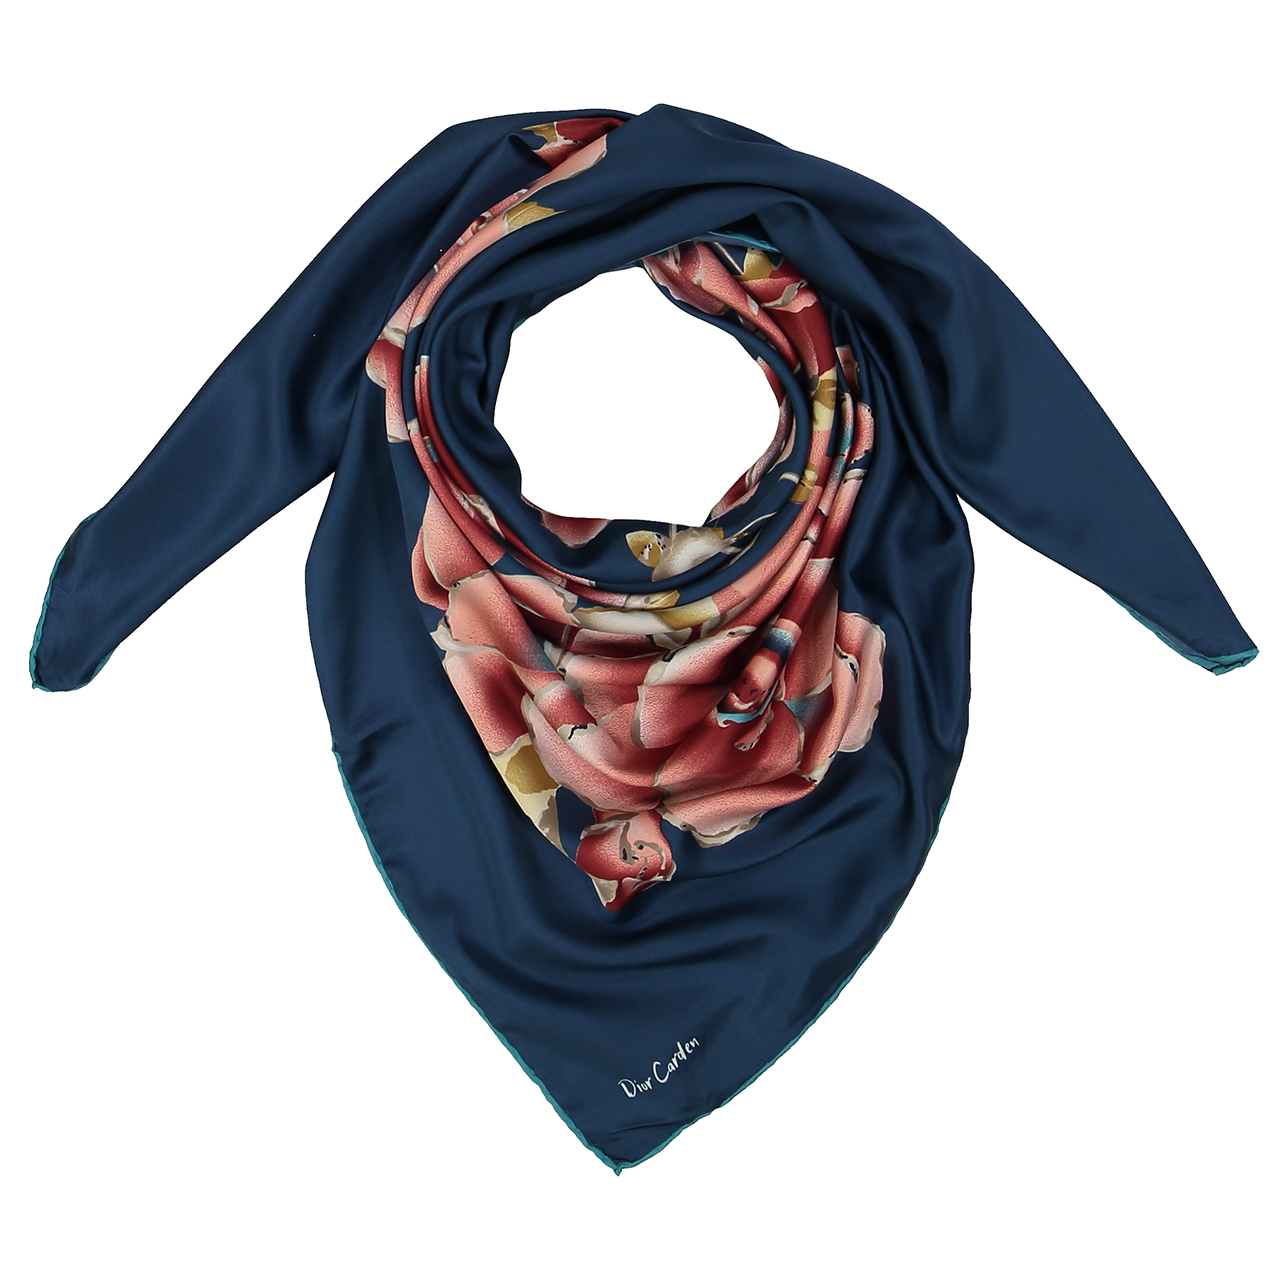 قیمت روسری زنانه دیور کاردن کد 100